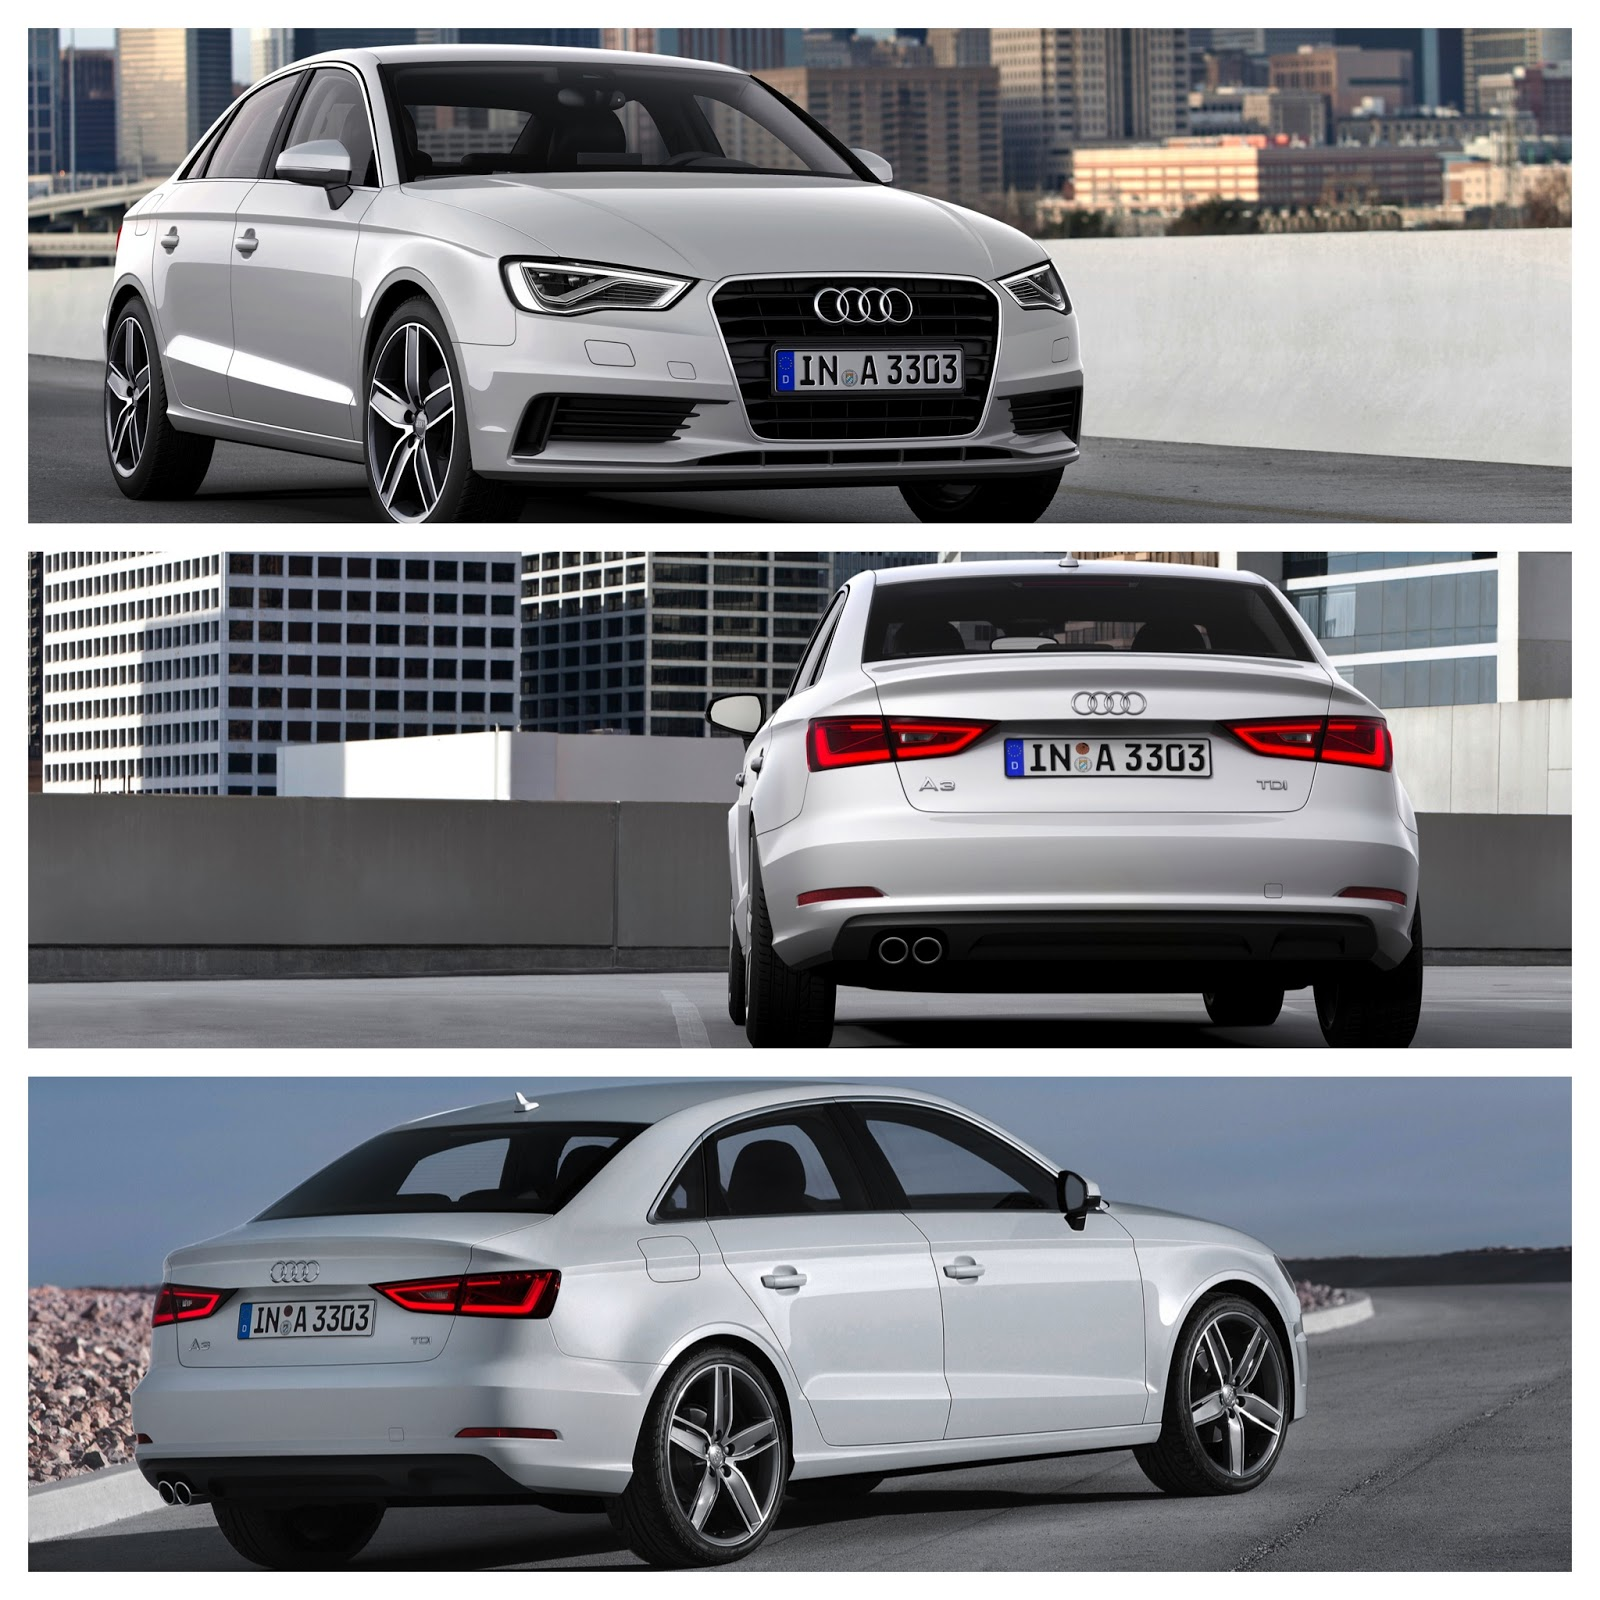 New Audi A3 Sedan: New Audi A4 Competitor?